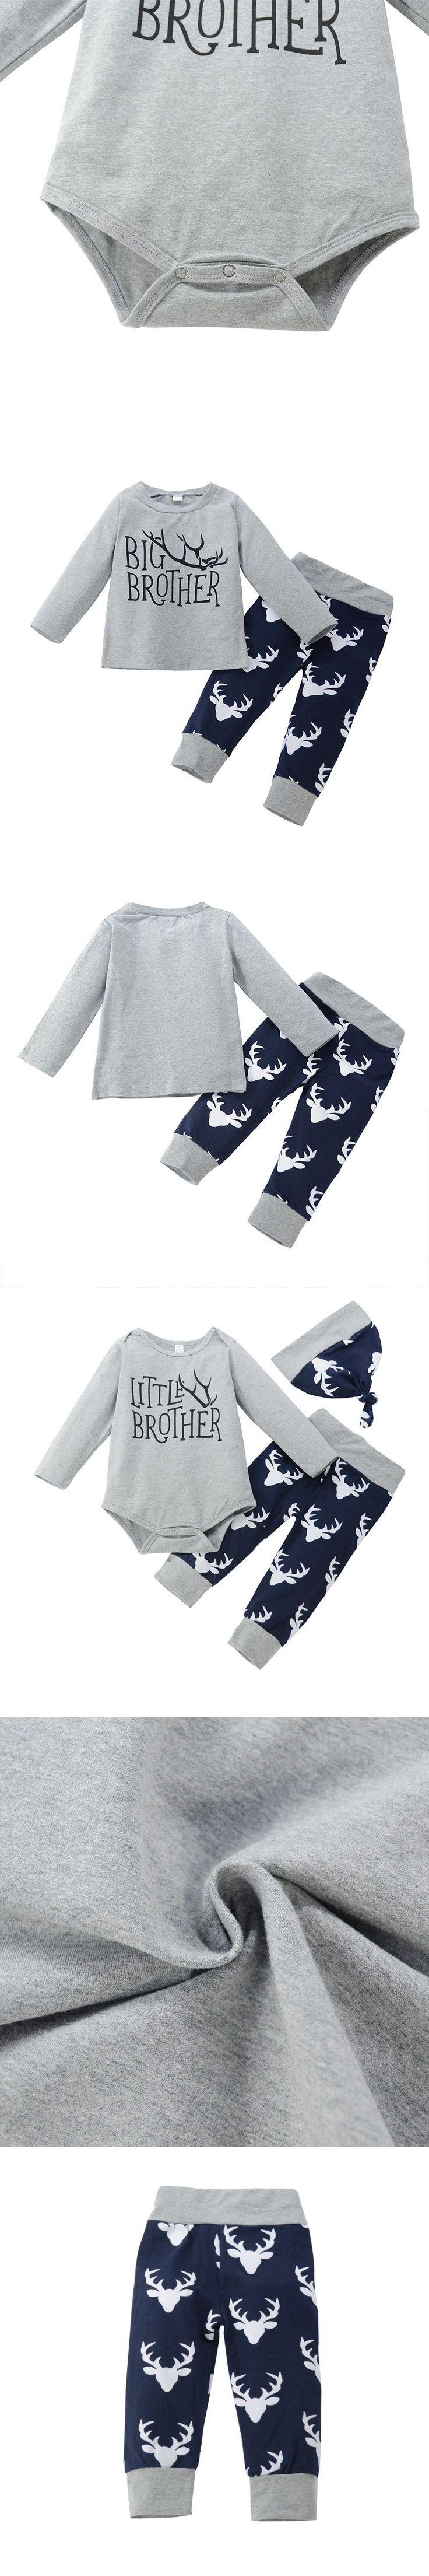 Brother Clothes Set Xmas Newborn Baby Boys Romper Boyss T-shirt Tops +Deer Pants Leggings Outfits Family Set